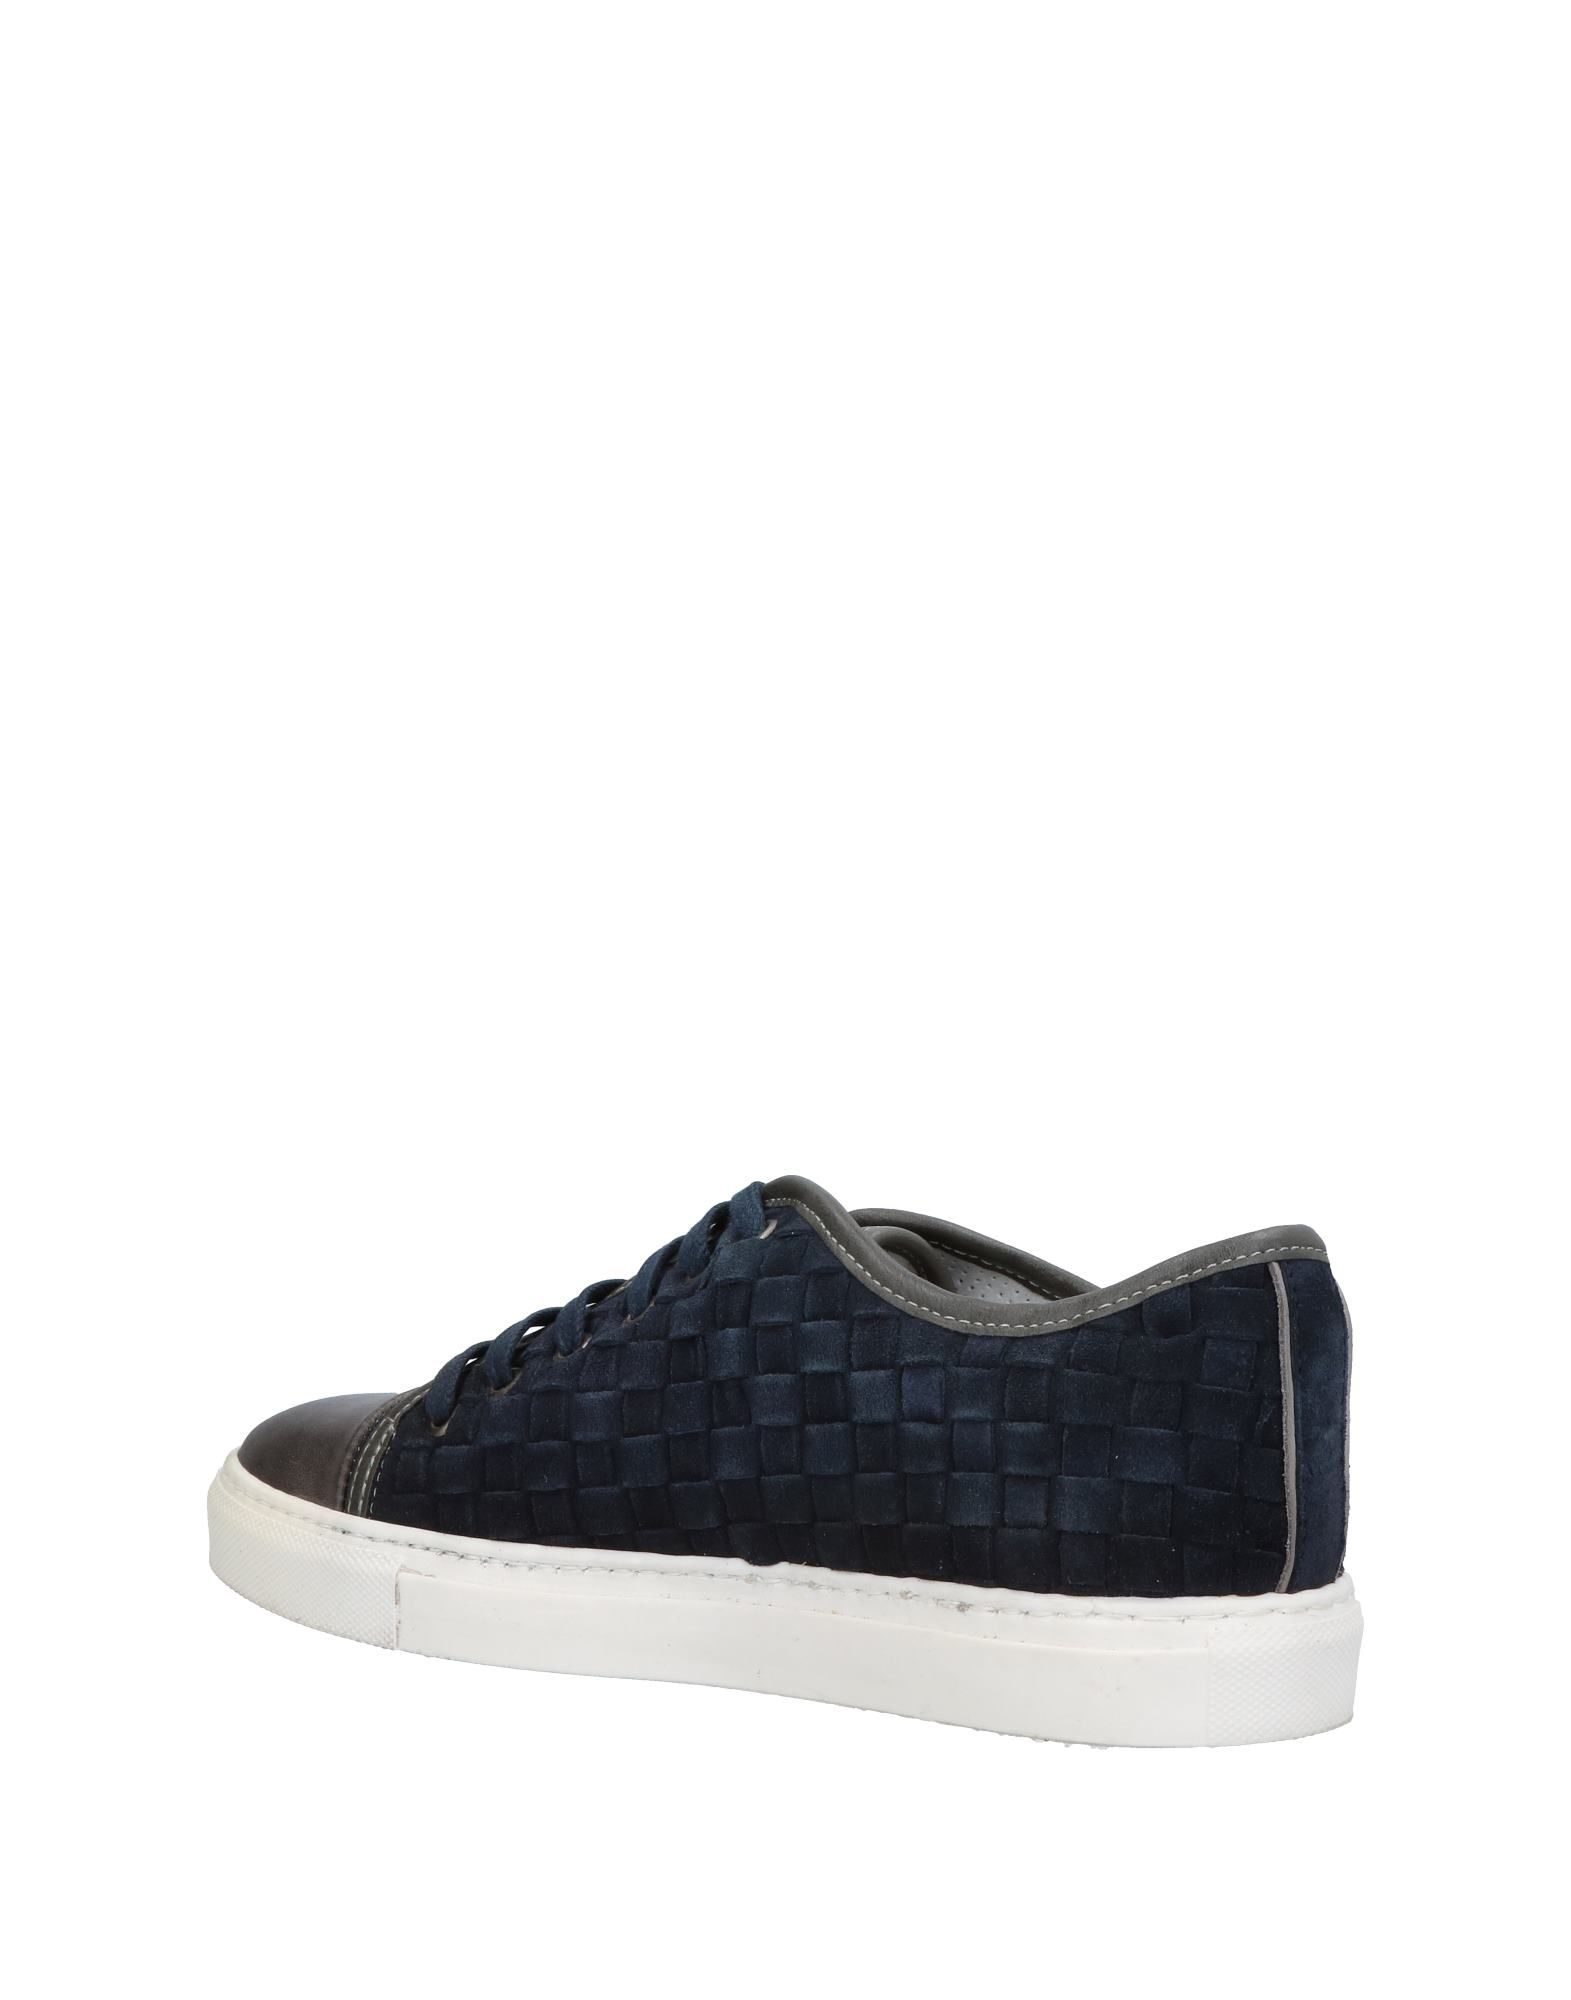 Daniele Alessandrini Sneakers - - - Men Daniele Alessandrini Sneakers online on  United Kingdom - 11391037MT 15b063